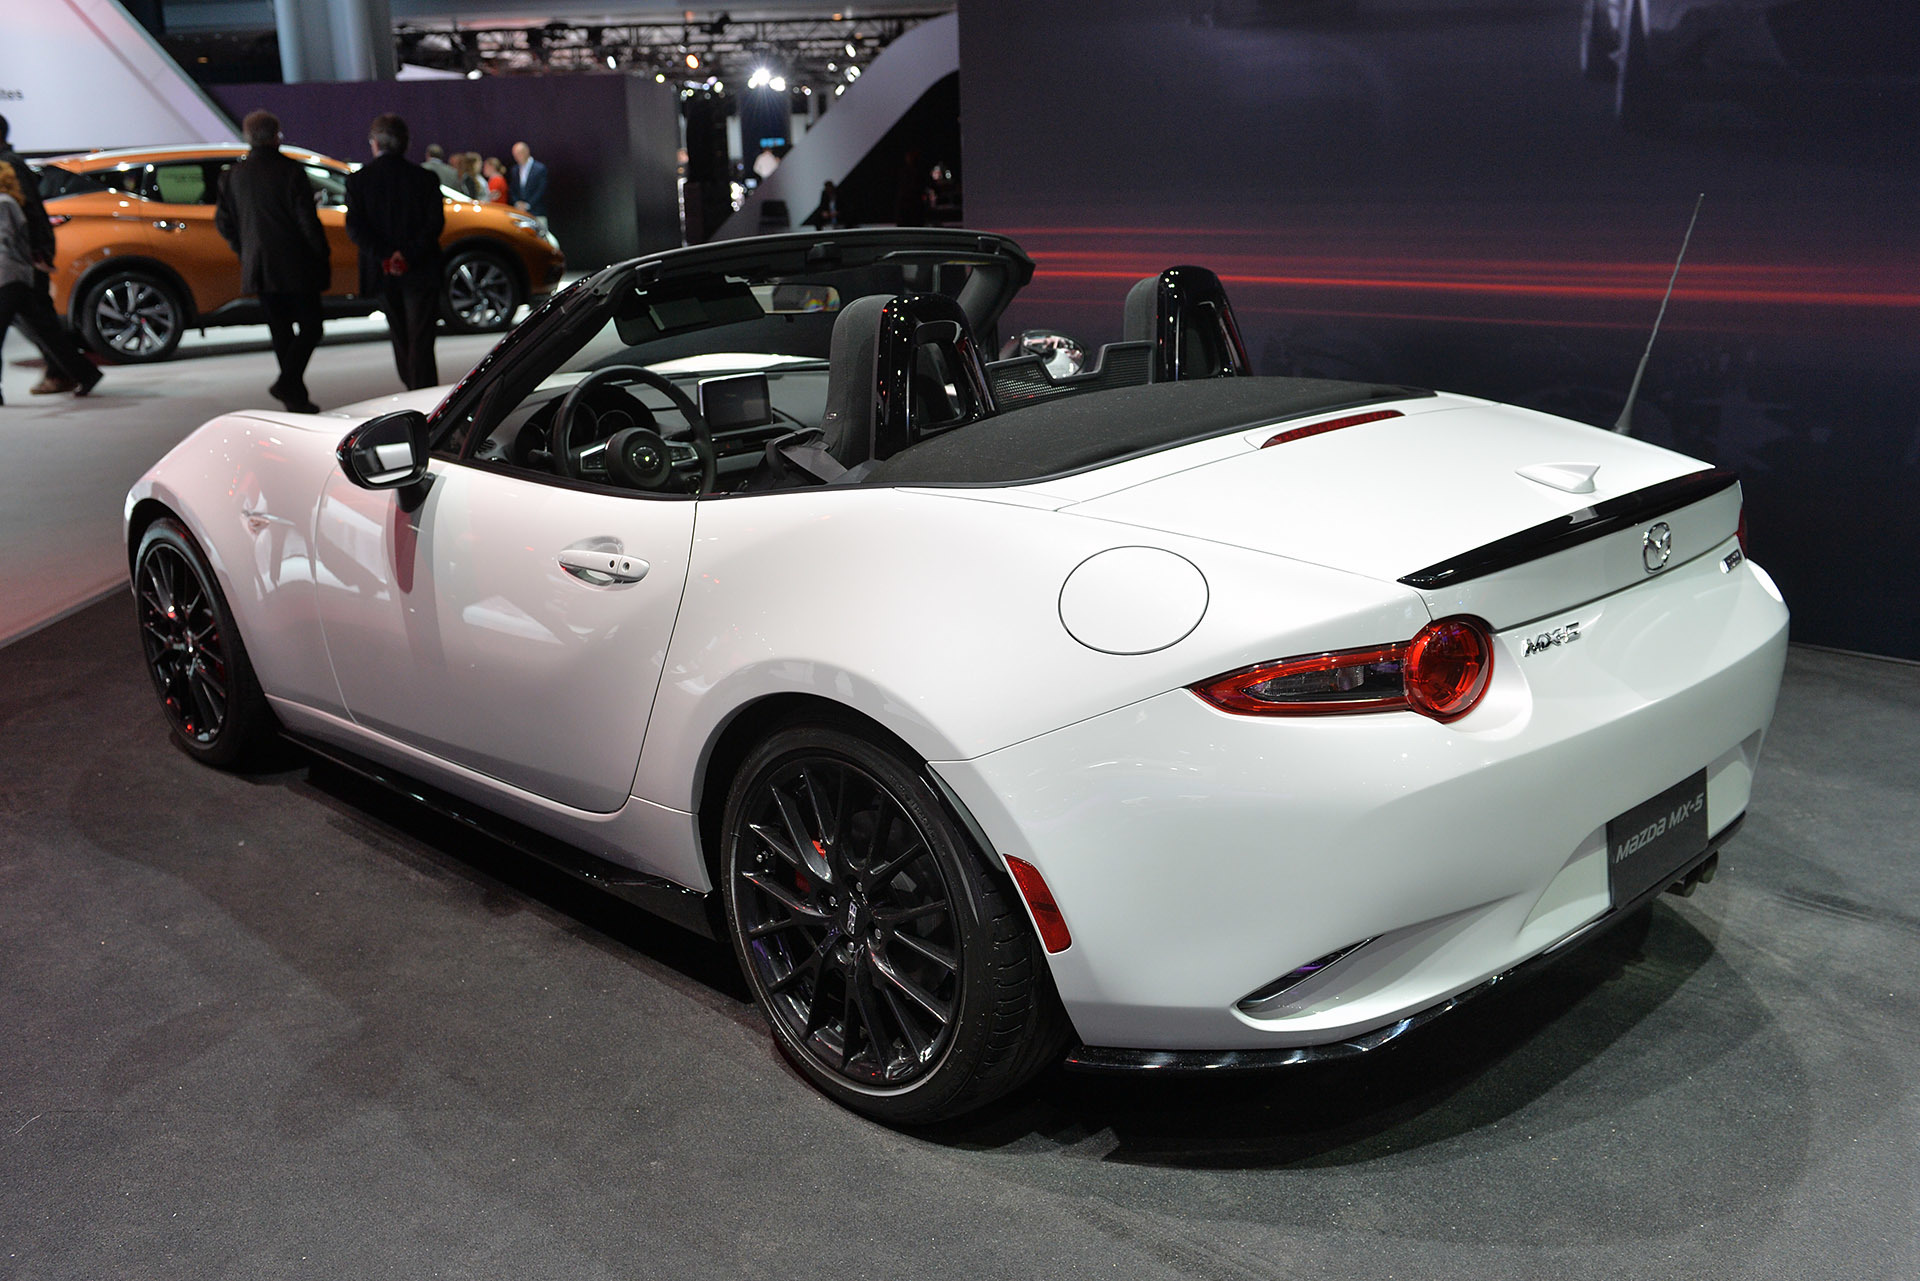 auto show de nueva york 2015 mazda mx 5 miata club edition lista de carros. Black Bedroom Furniture Sets. Home Design Ideas